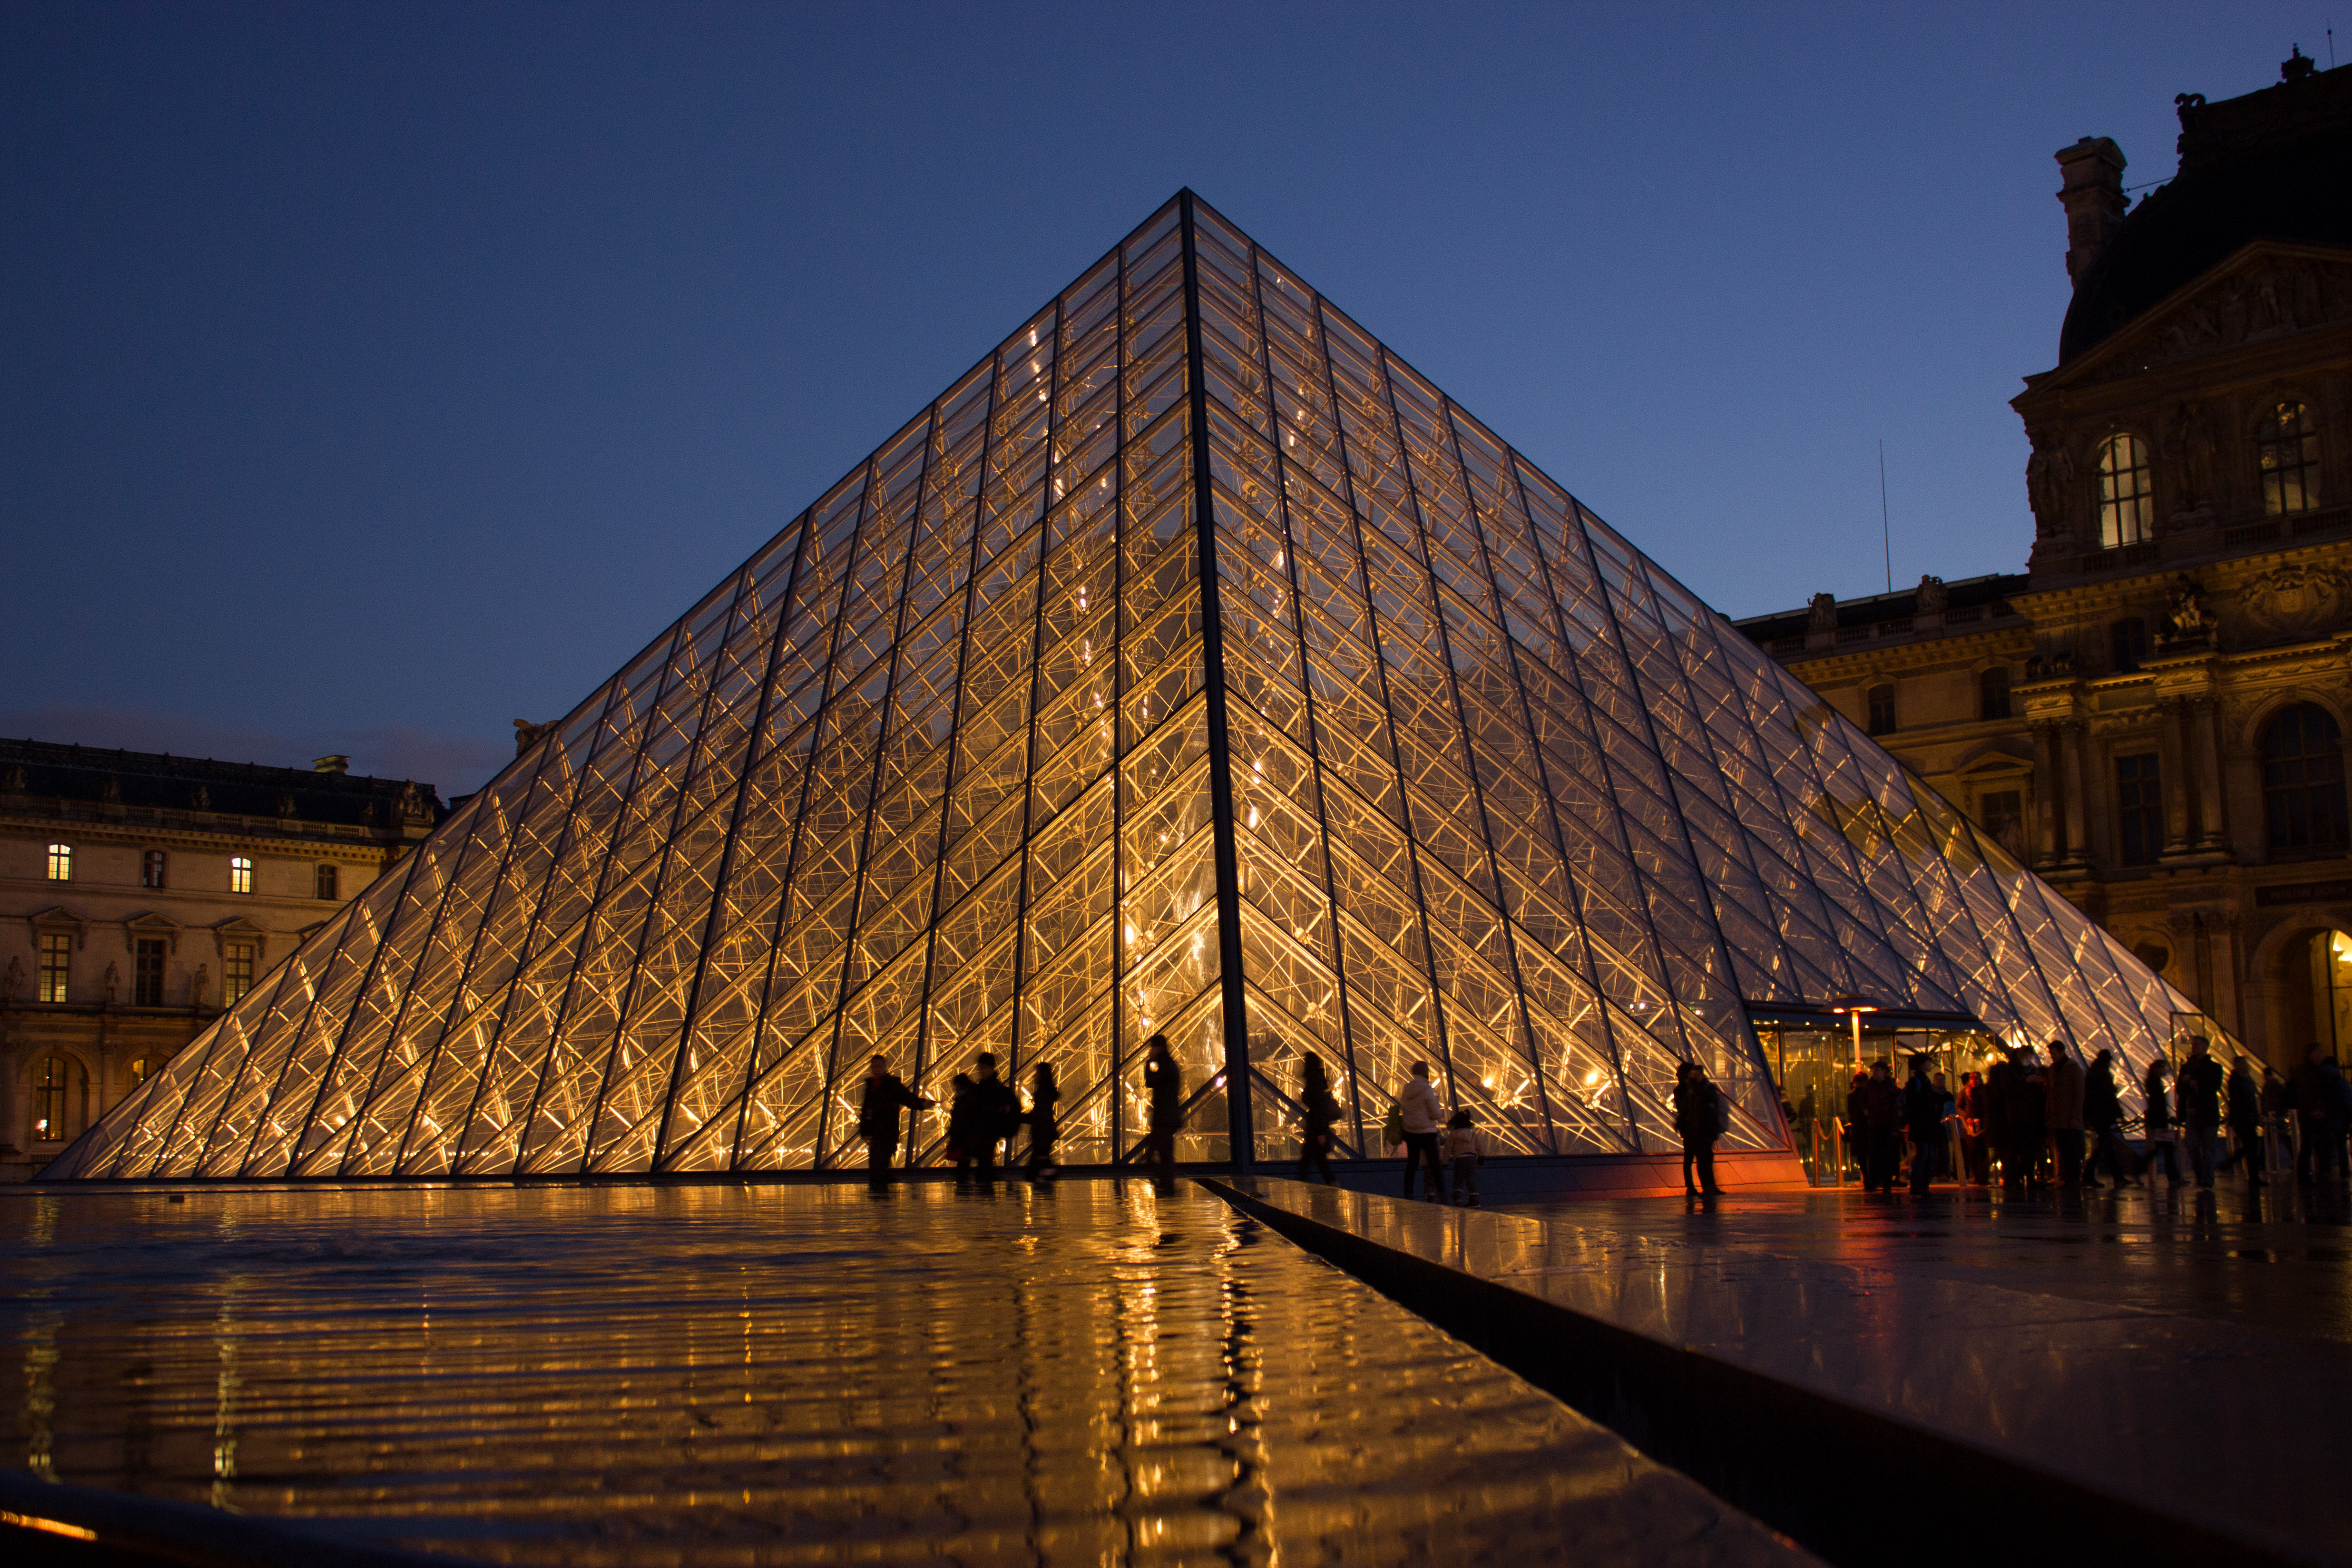 8592a47aa6d2 Know Activities Paris – Explore Paris with Pickyourtrail Guides!